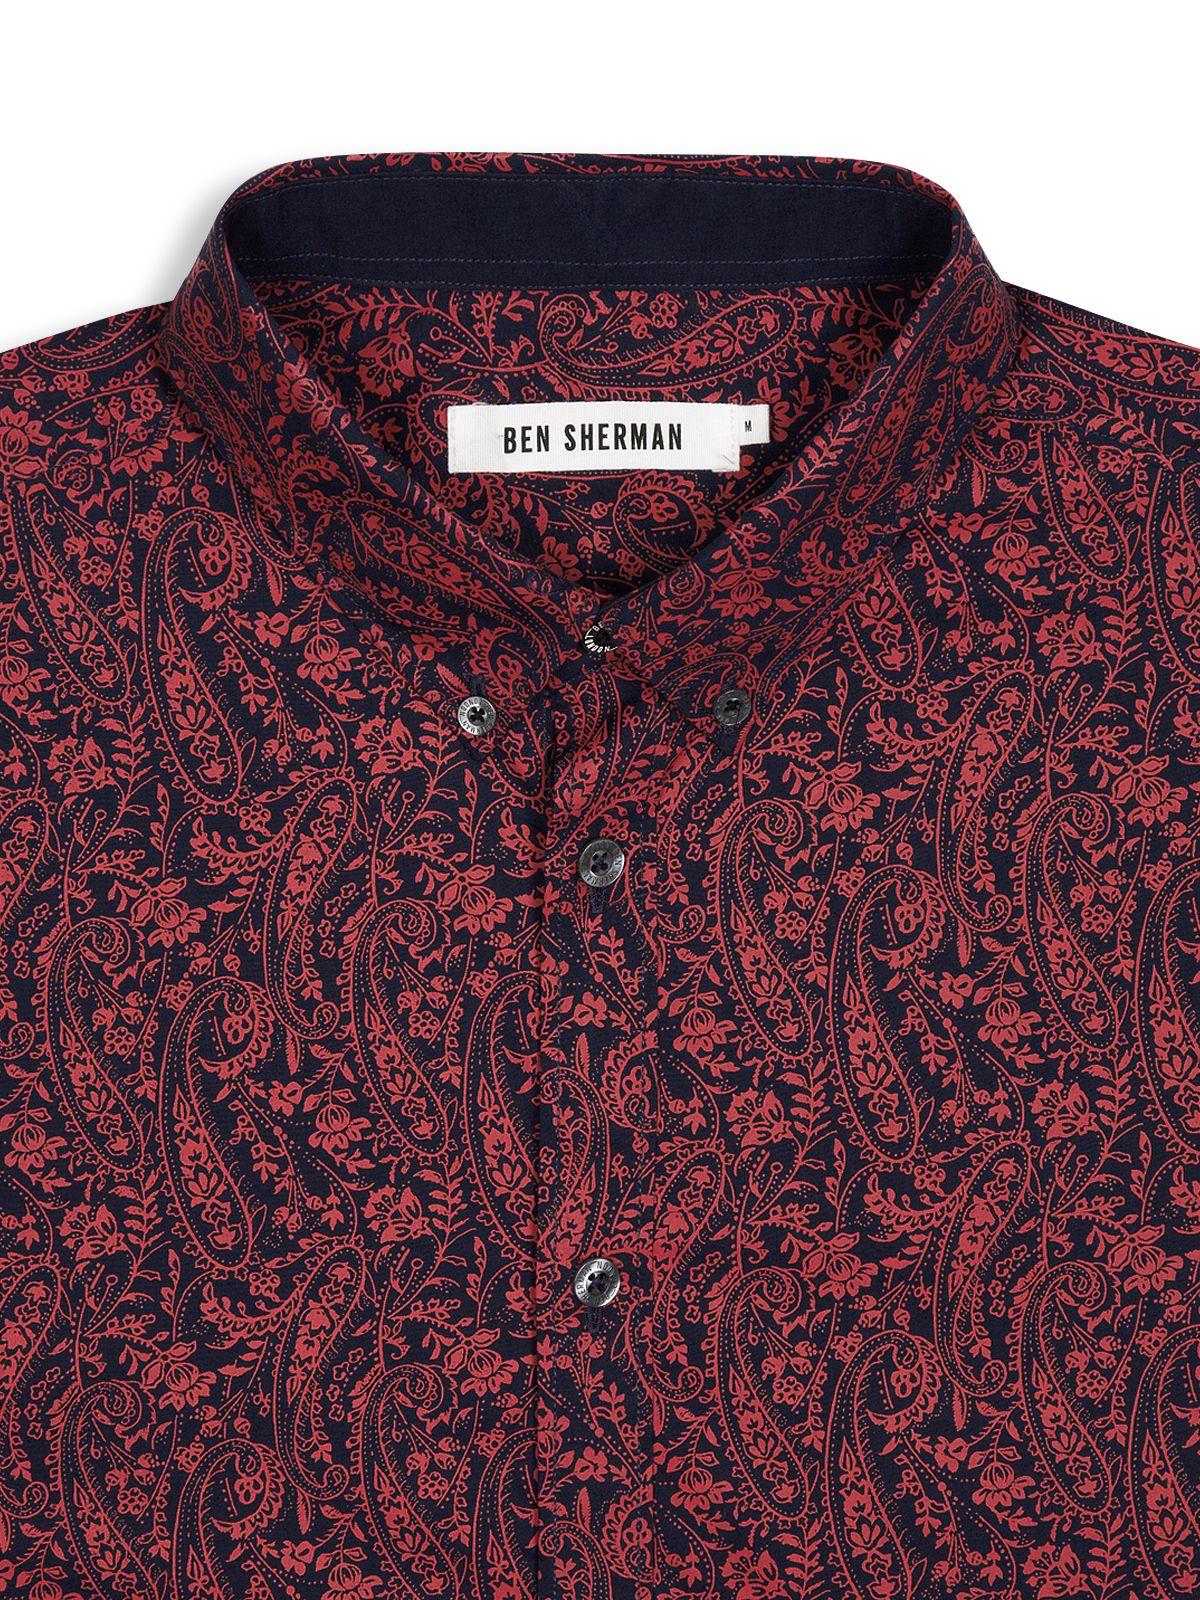 Ben sherman Paisley Shirt in Black for Men